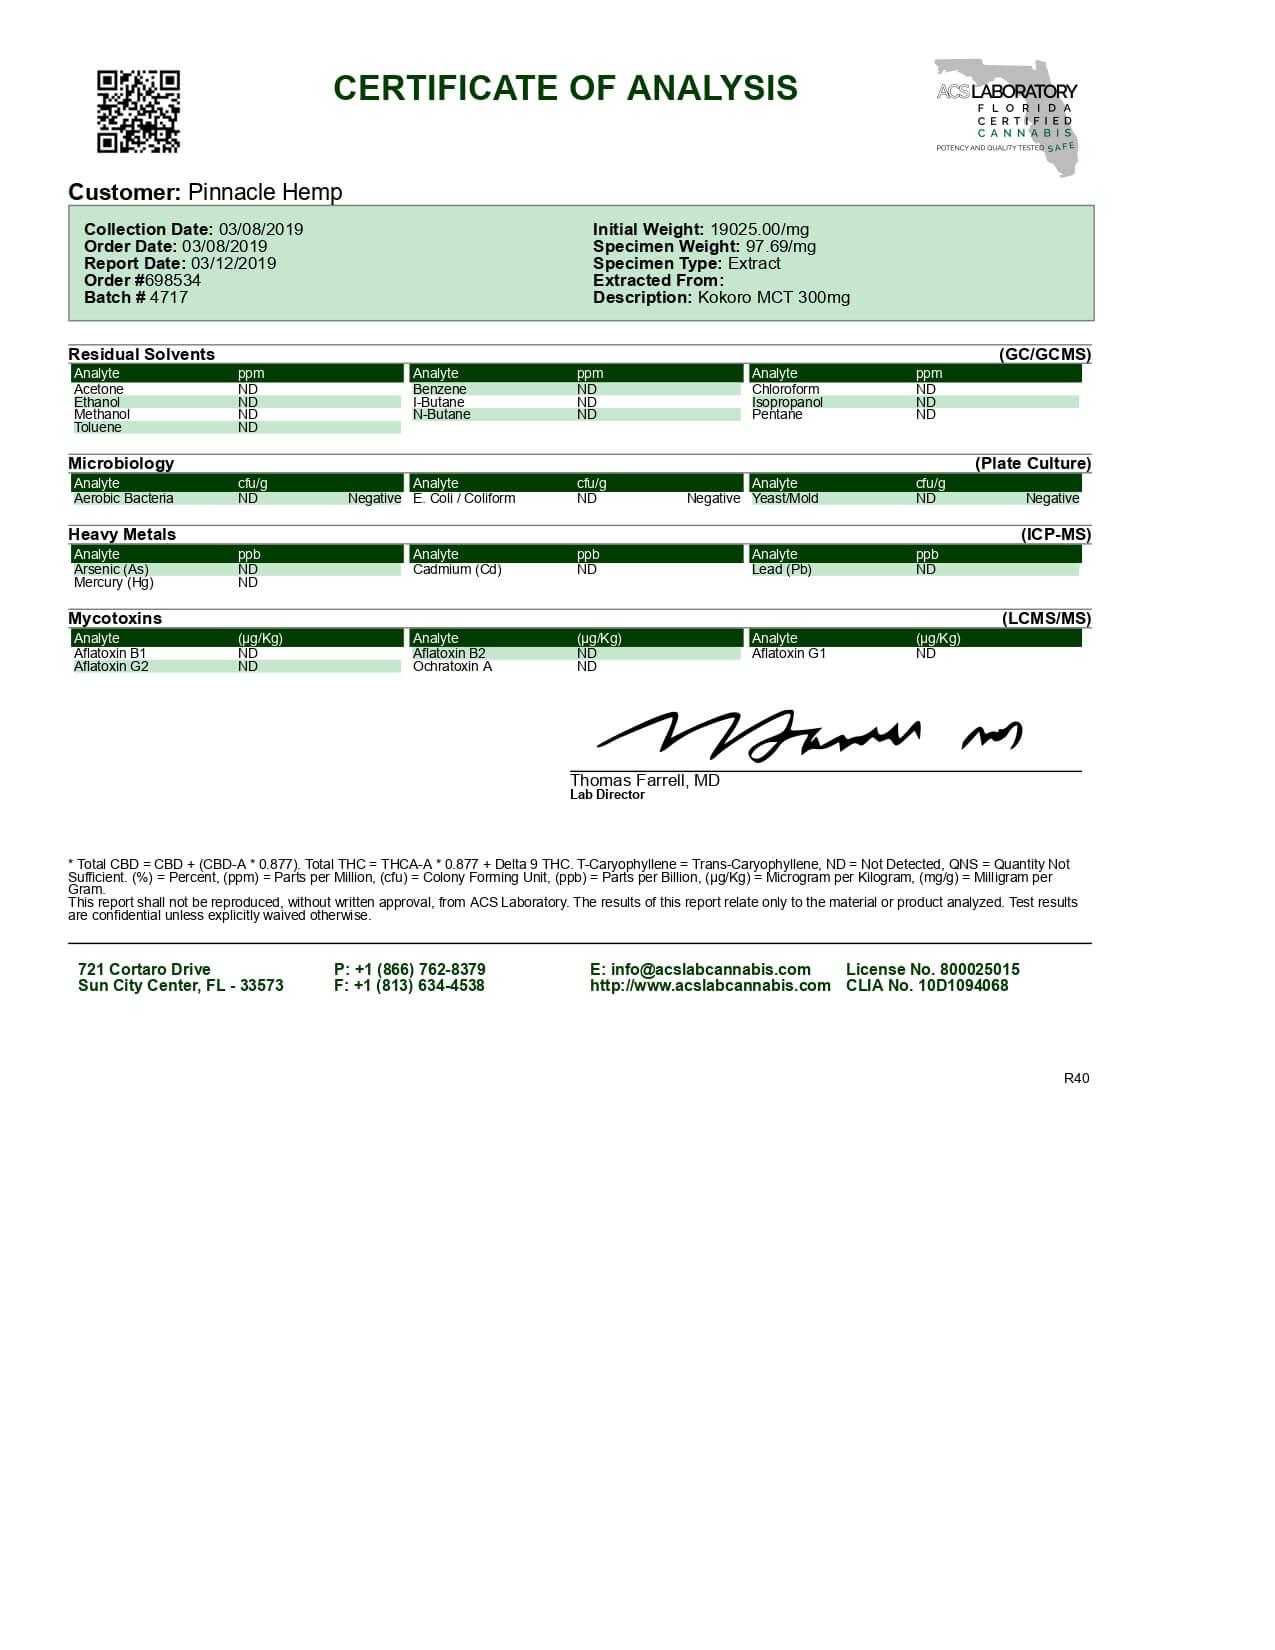 Kokoro CBD Tincture Broad Spectrum MCT Oil 300mg Lab Report